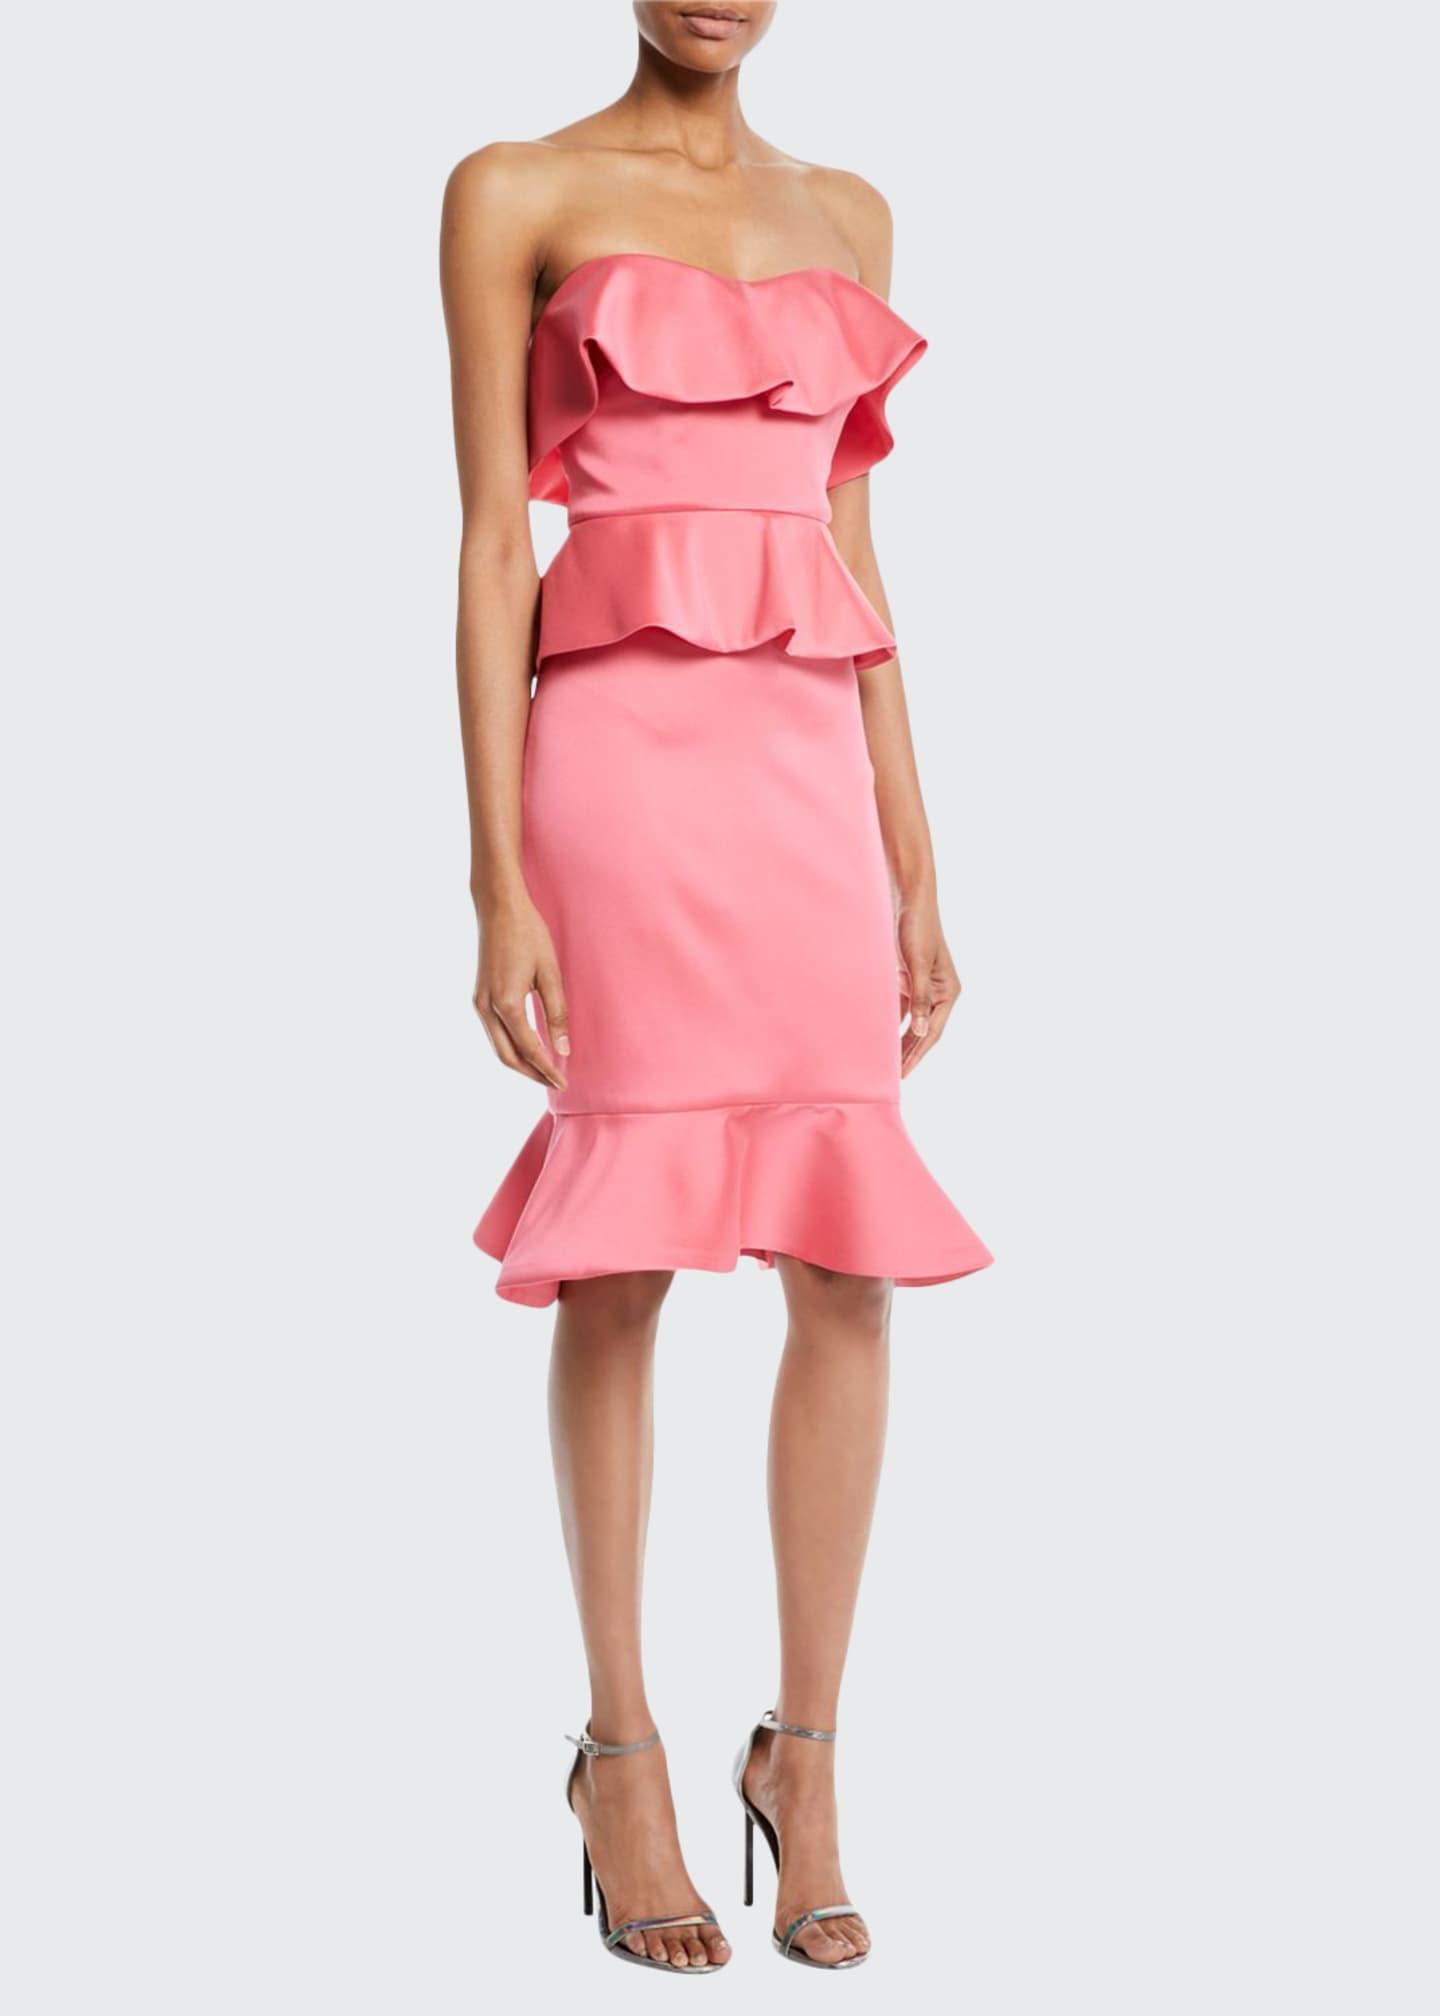 Badgley Mischka Collection Strapless Peplum Cocktail Dress